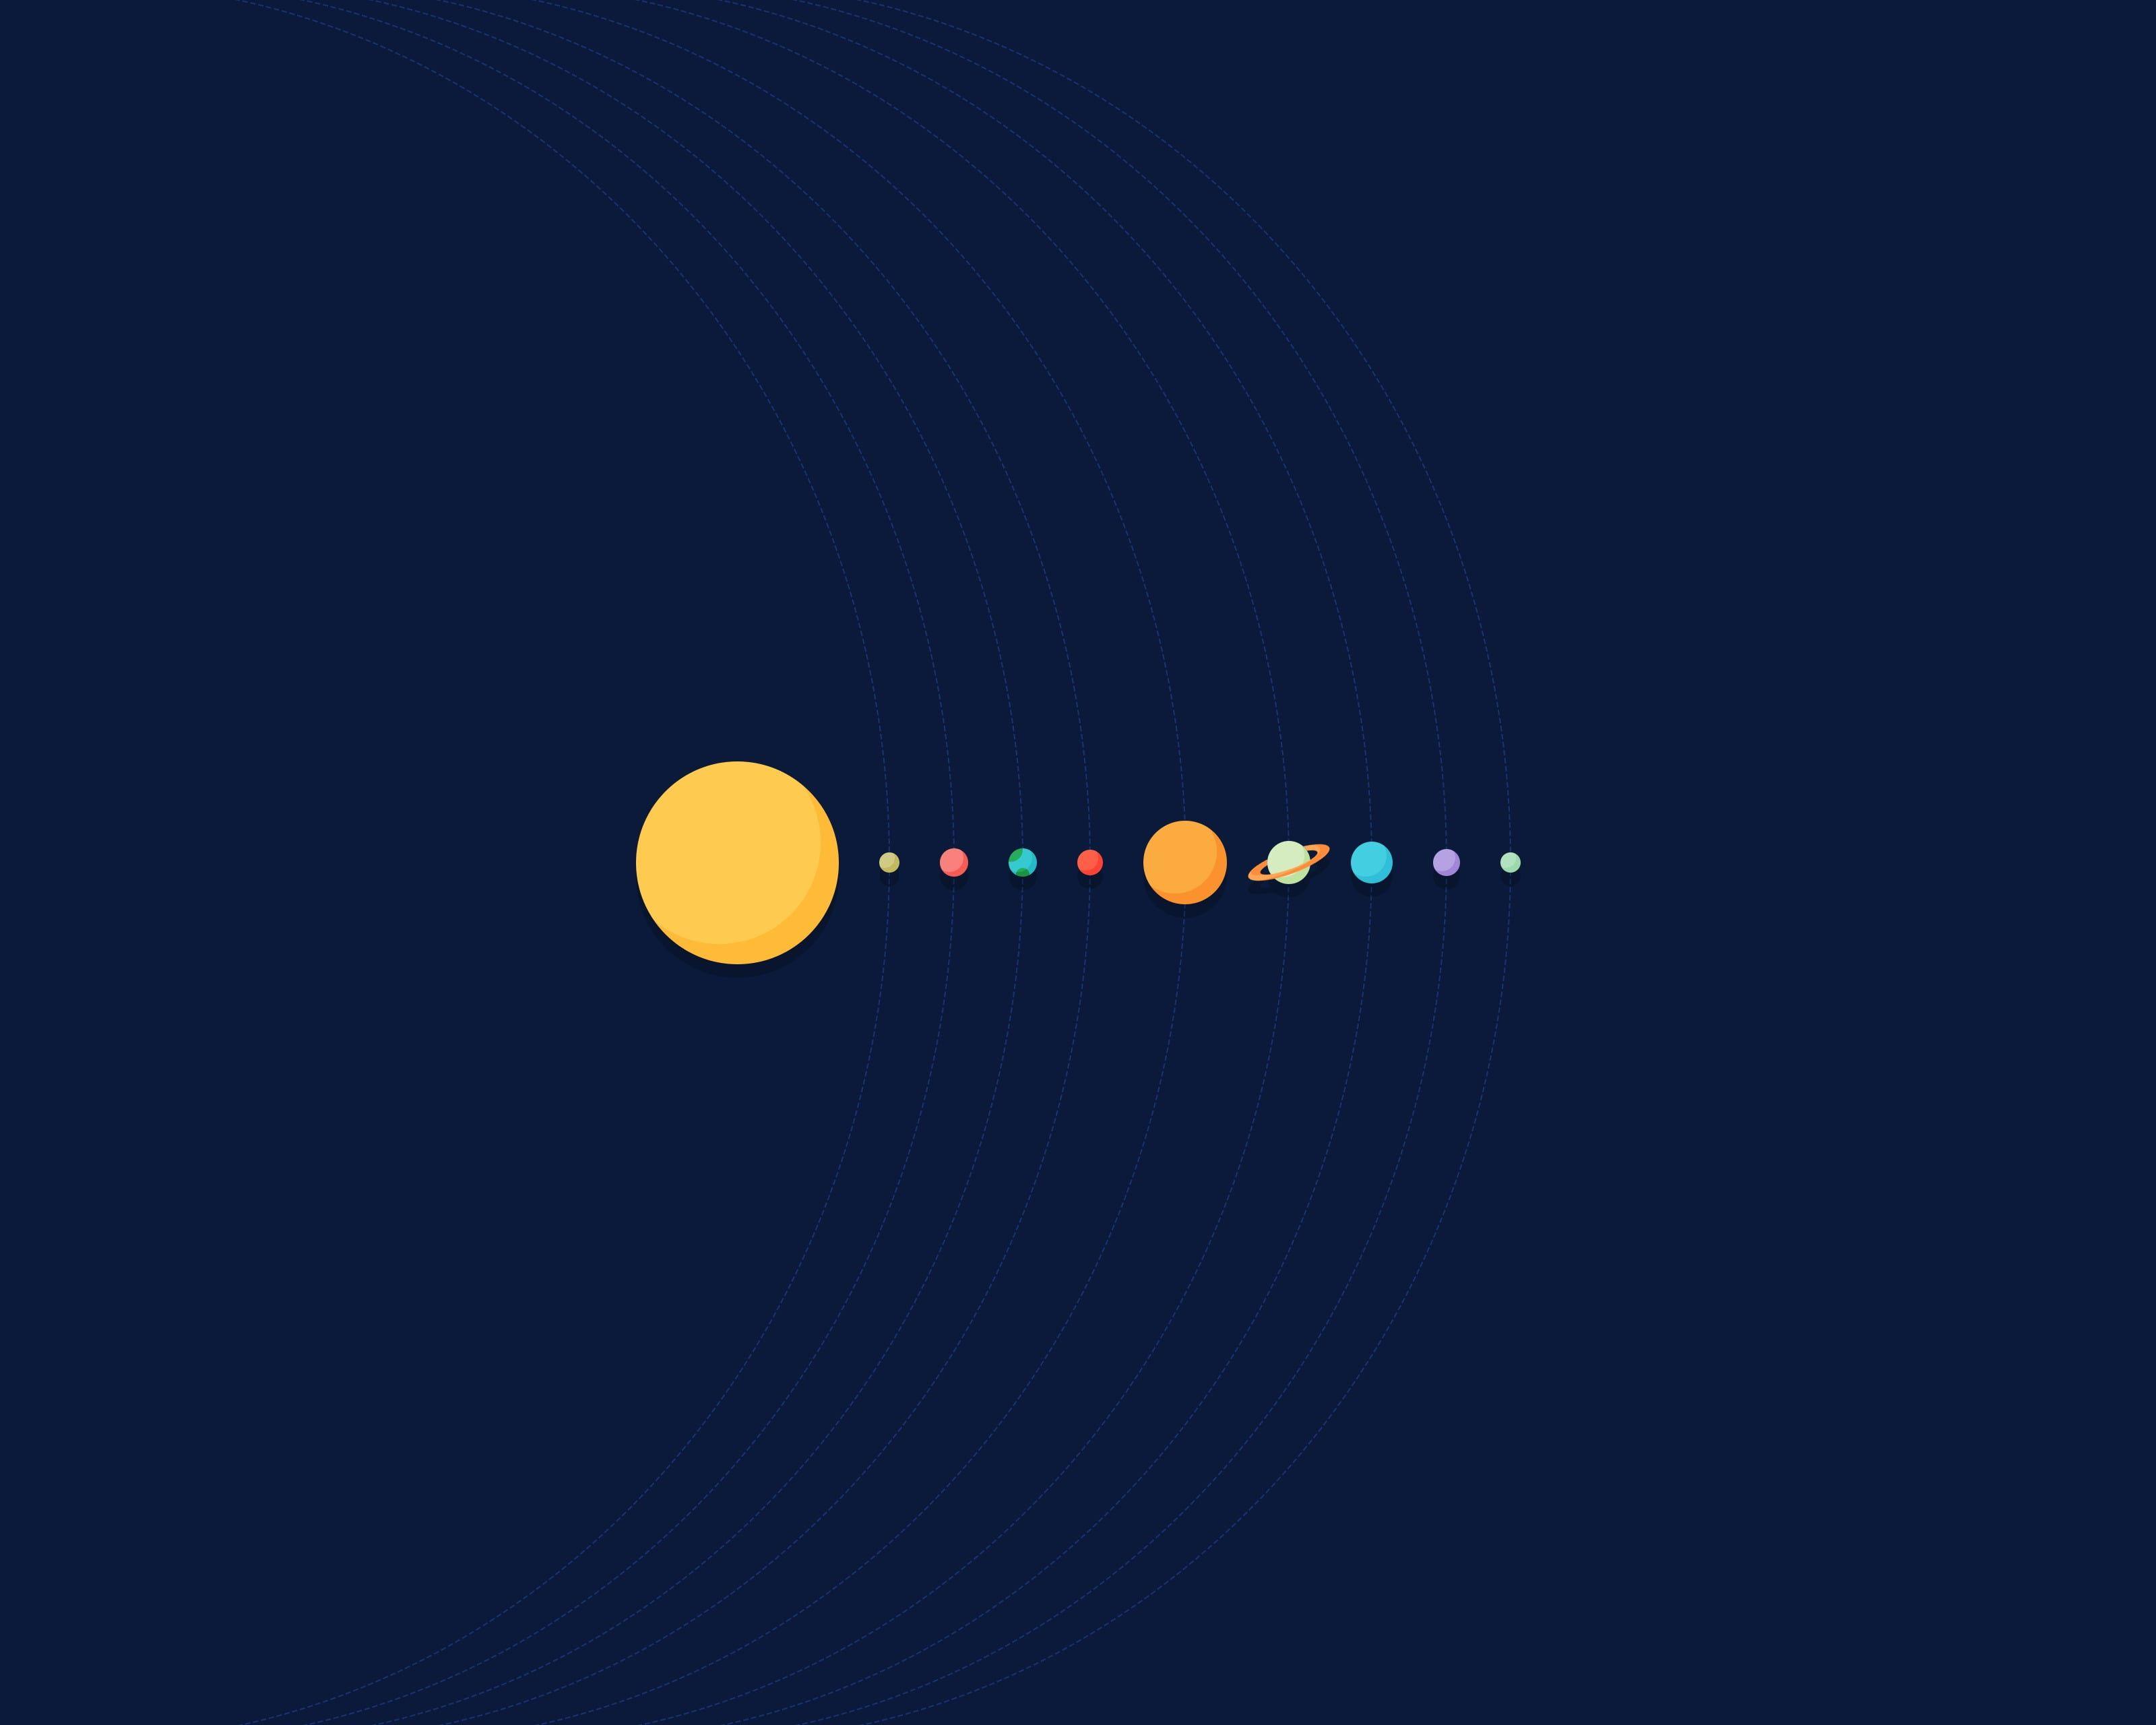 solar system illustration Solar System minimalism 2K